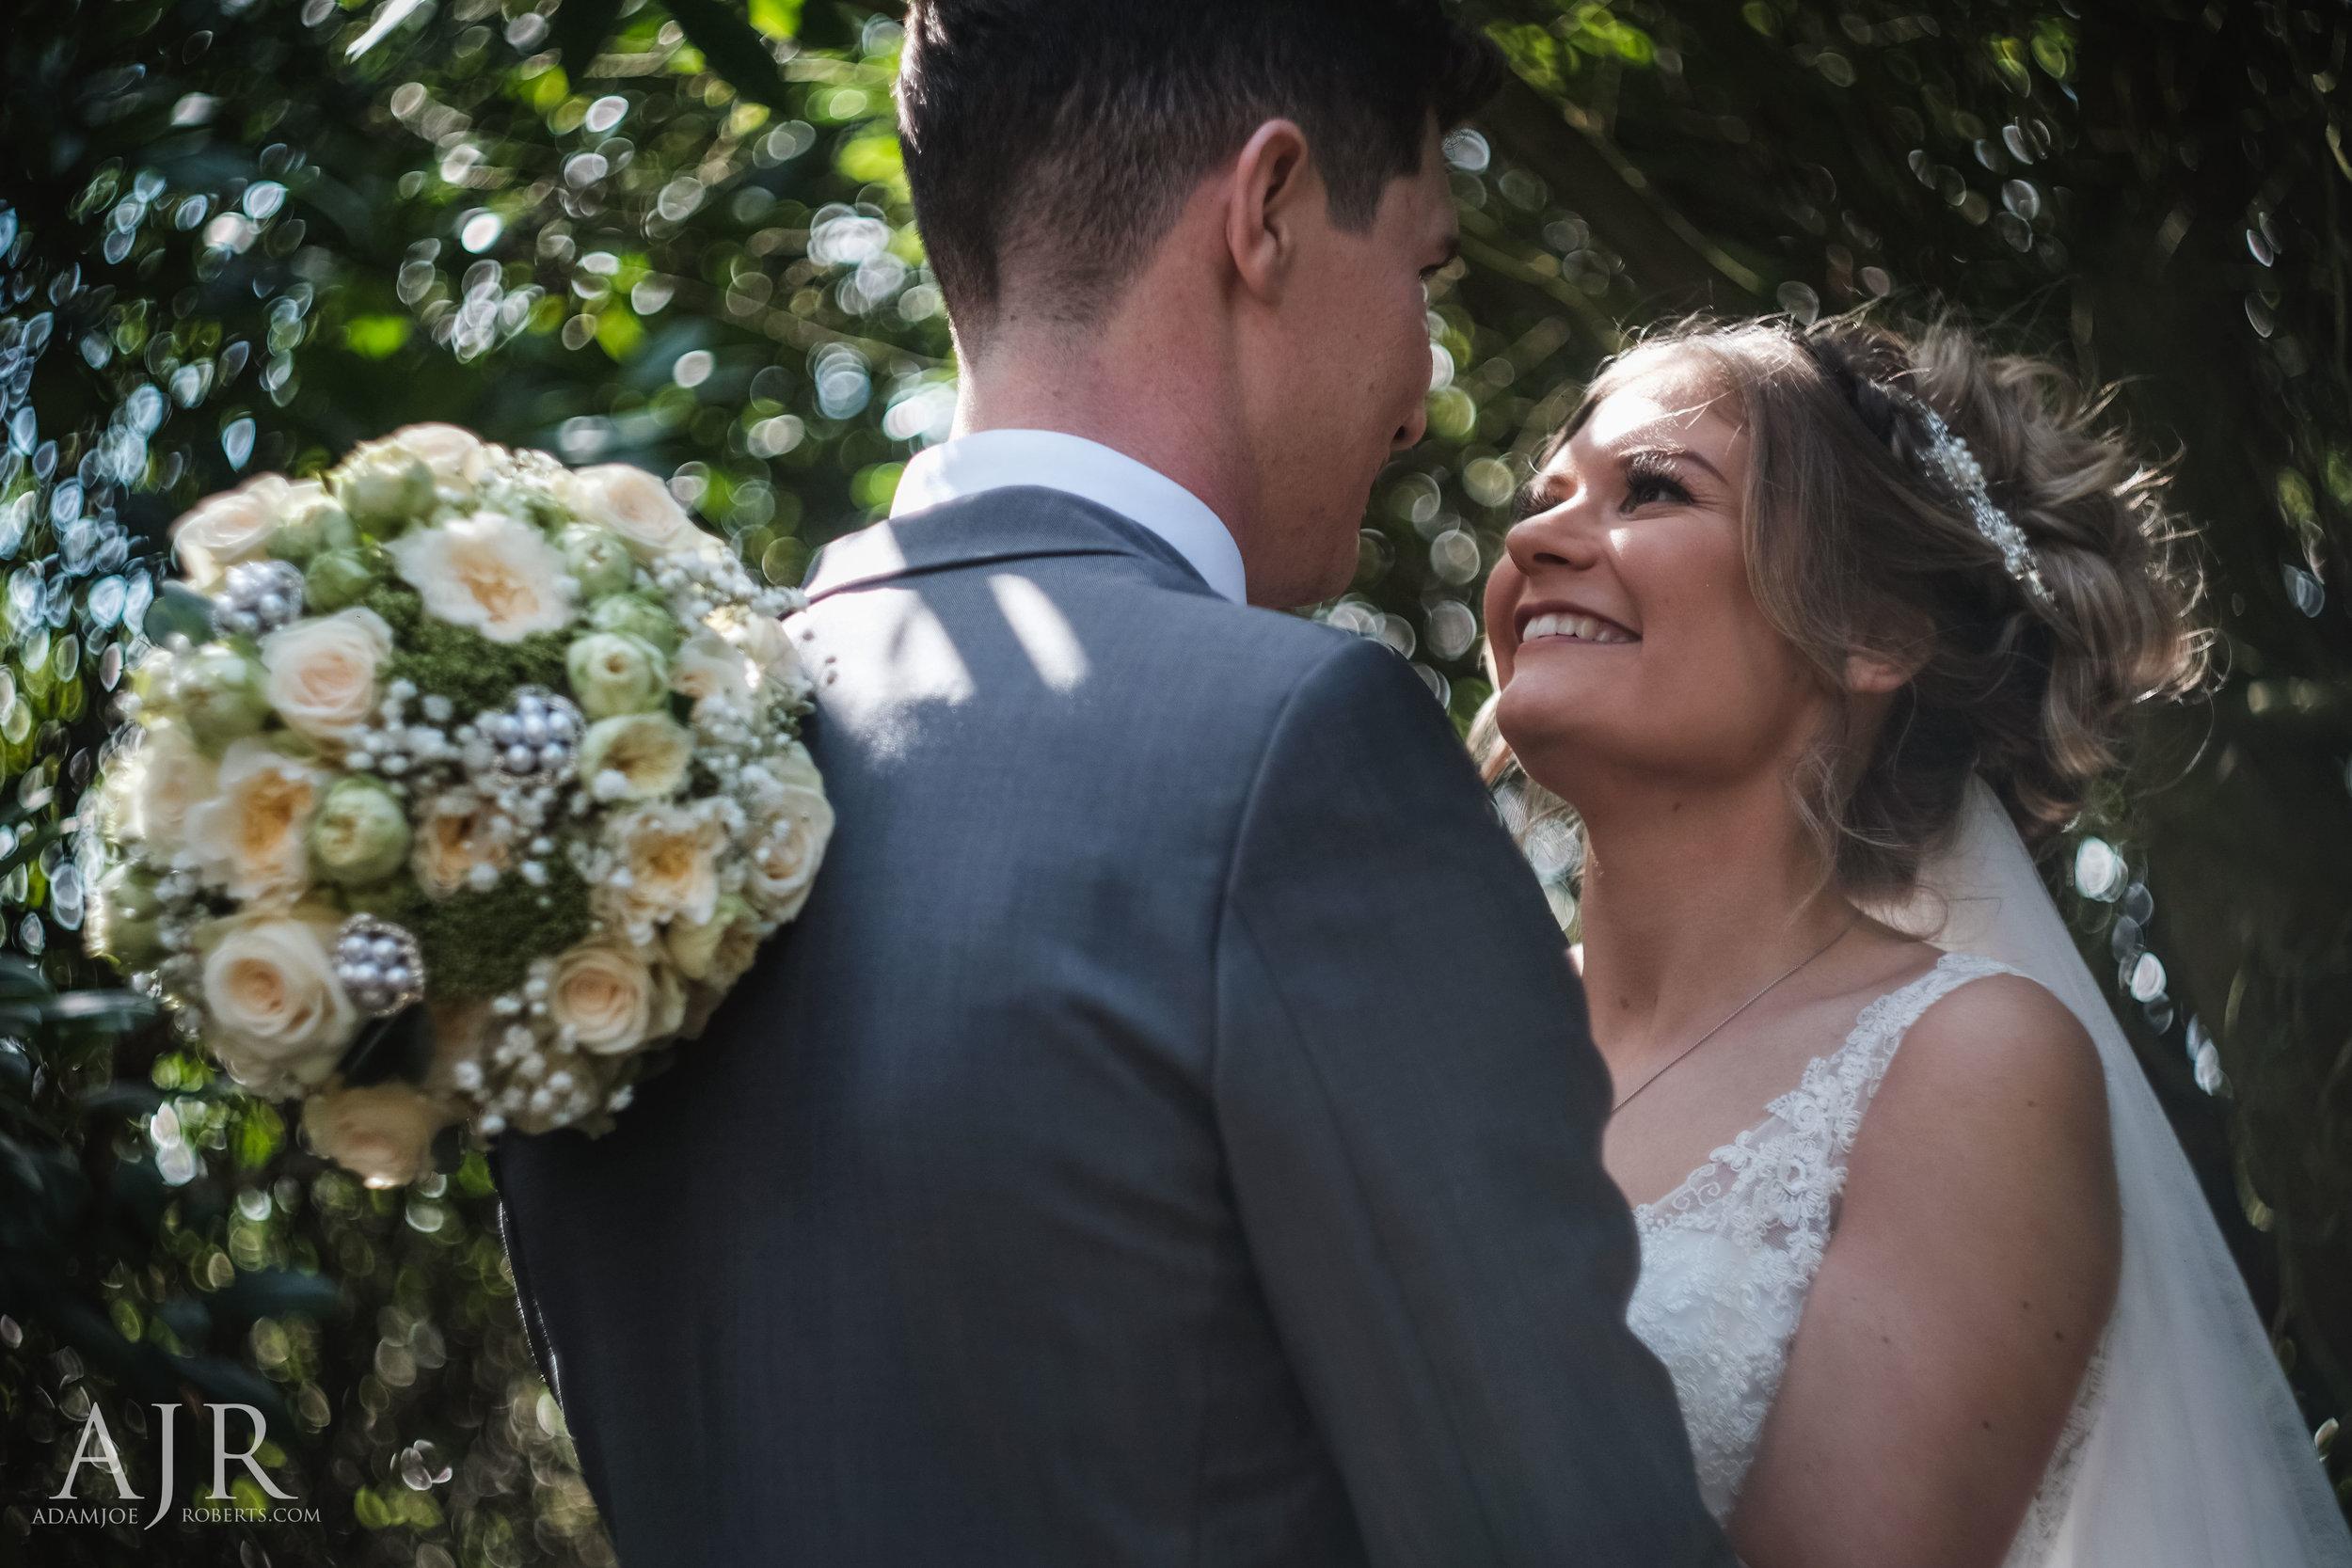 Eaves hall documenrty wedding photography | widnes cheshire wedding photographer sneak peek (9 of 11).jpg